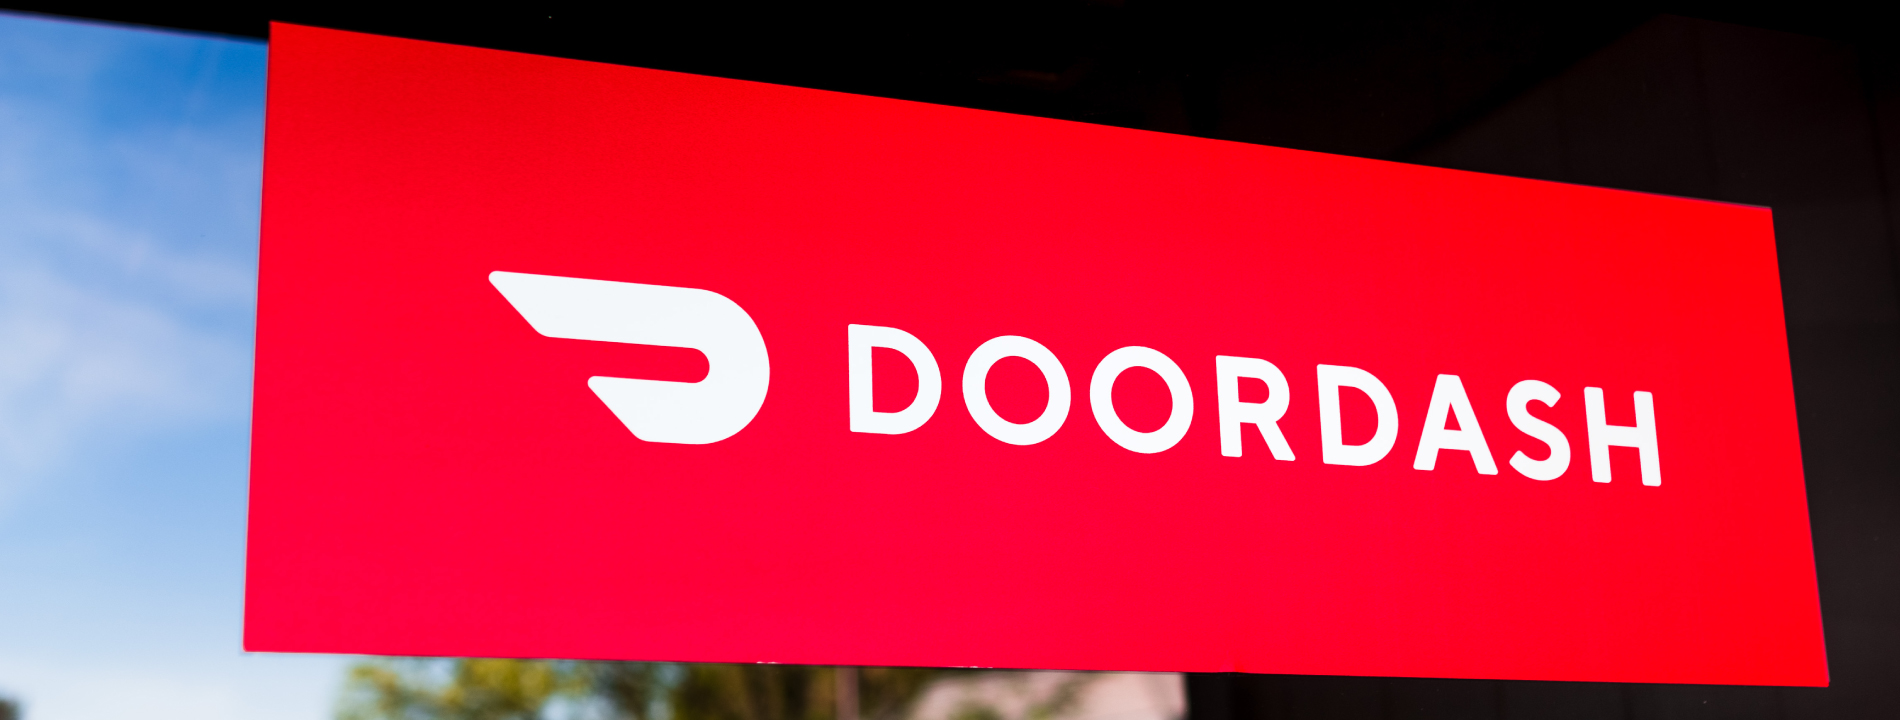 Gen Z Prefers DoorDash Over Other Food Delivery Service Providers